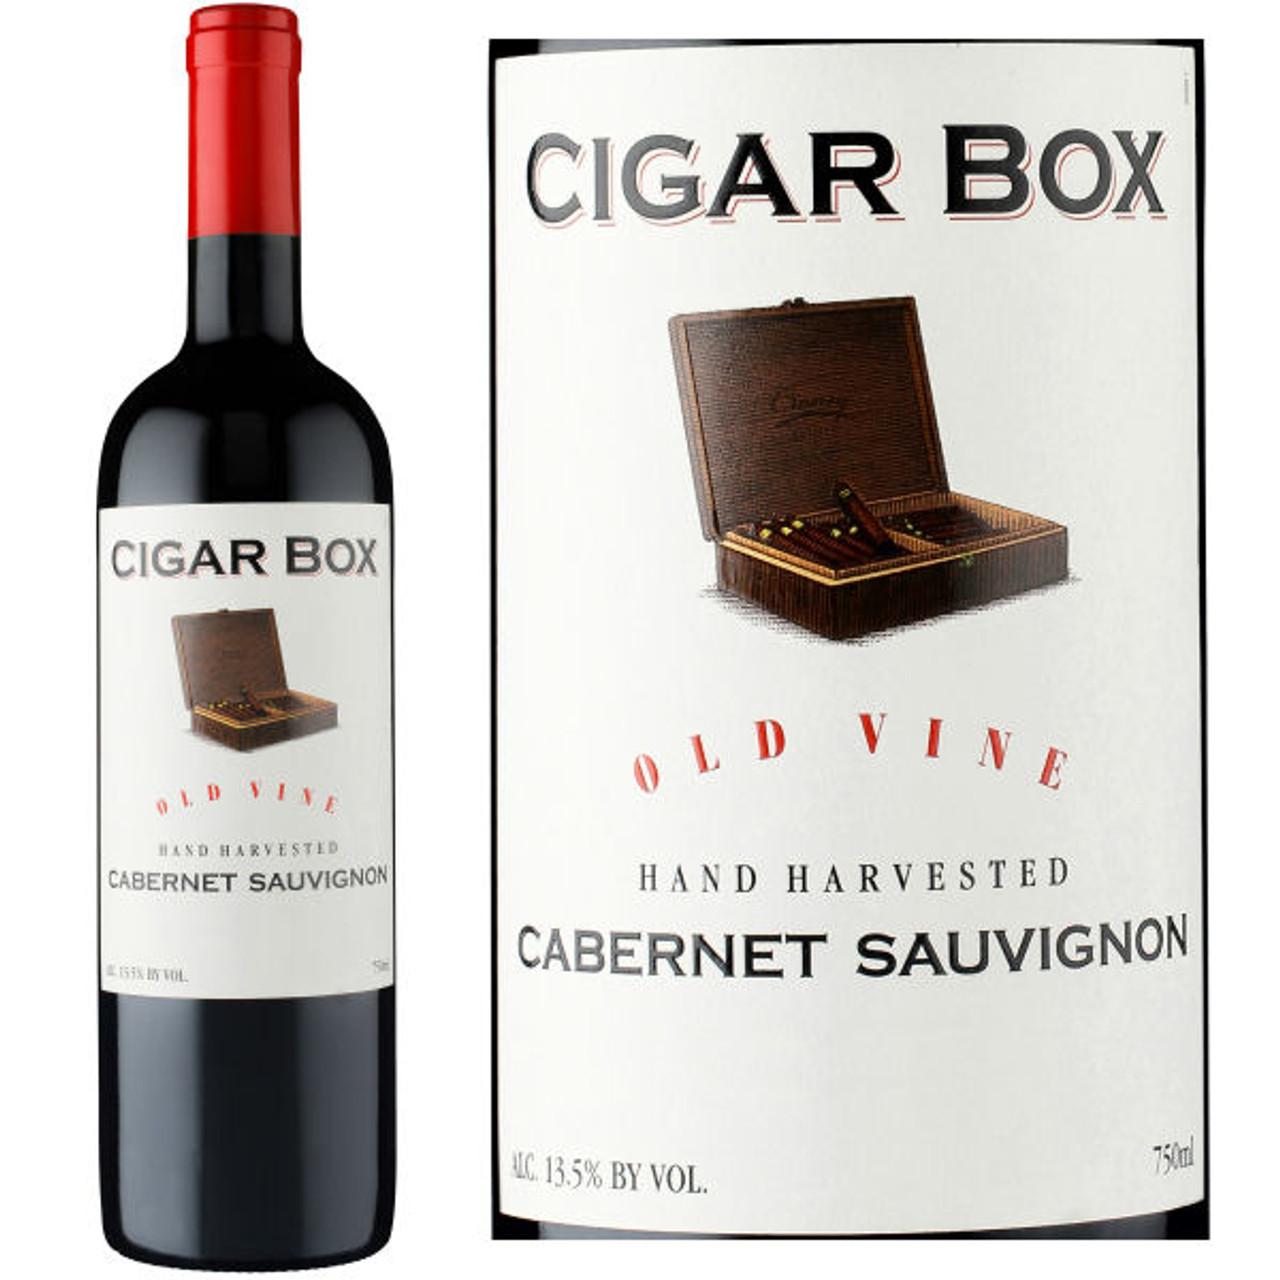 Cigar Box Old Vine Cabernet